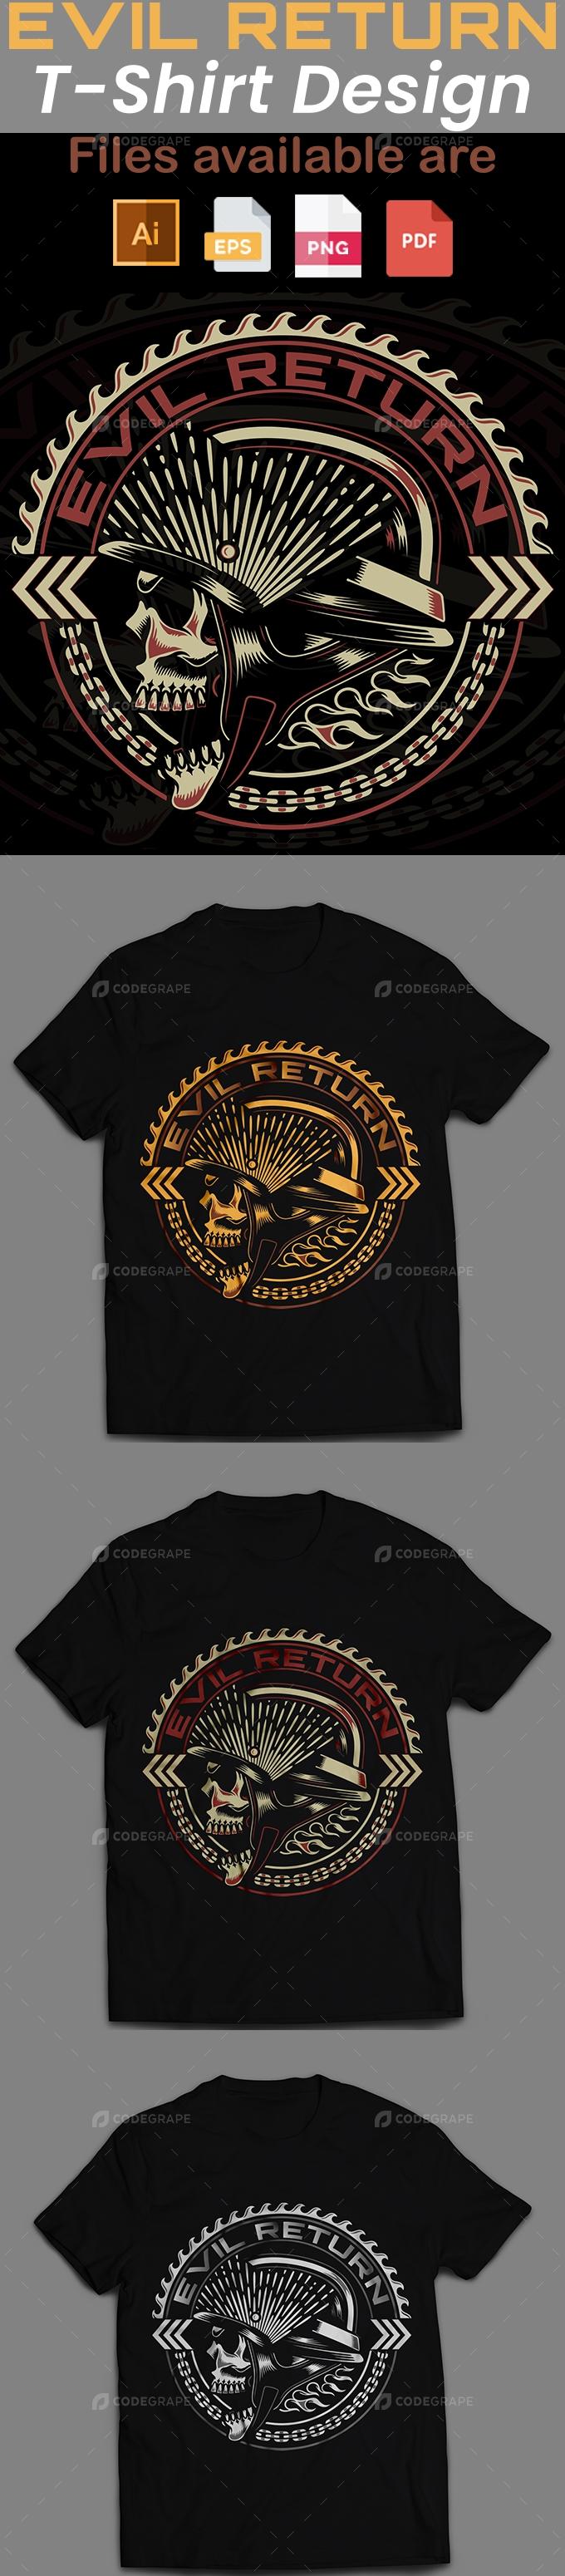 Evil Return T-Shirt Design